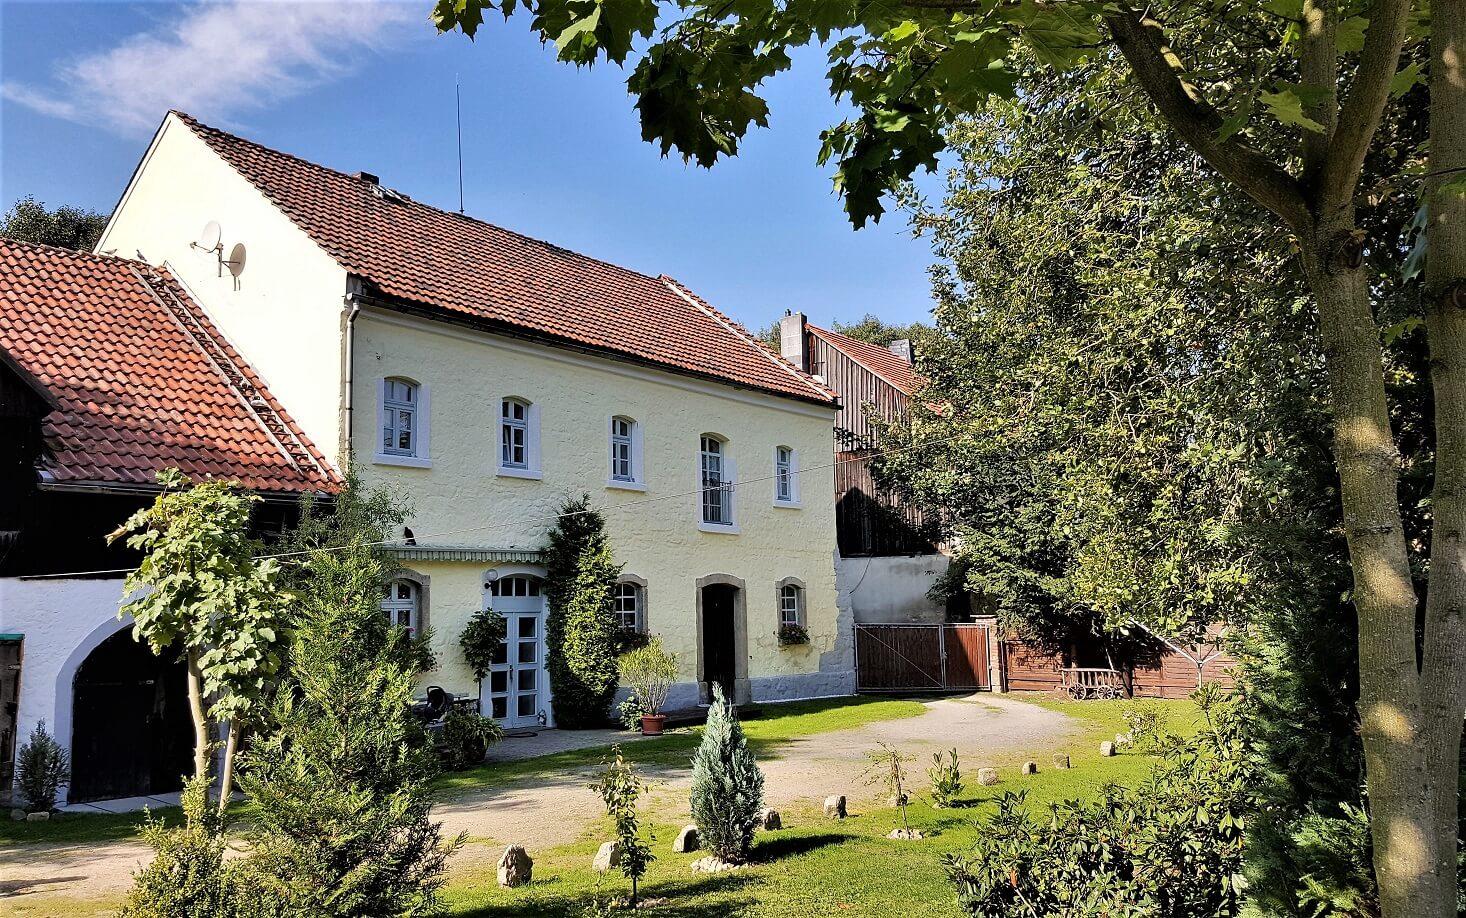 Rittergut Adlershof zu Oberlauterbach - Westflügel © Jens Reiher